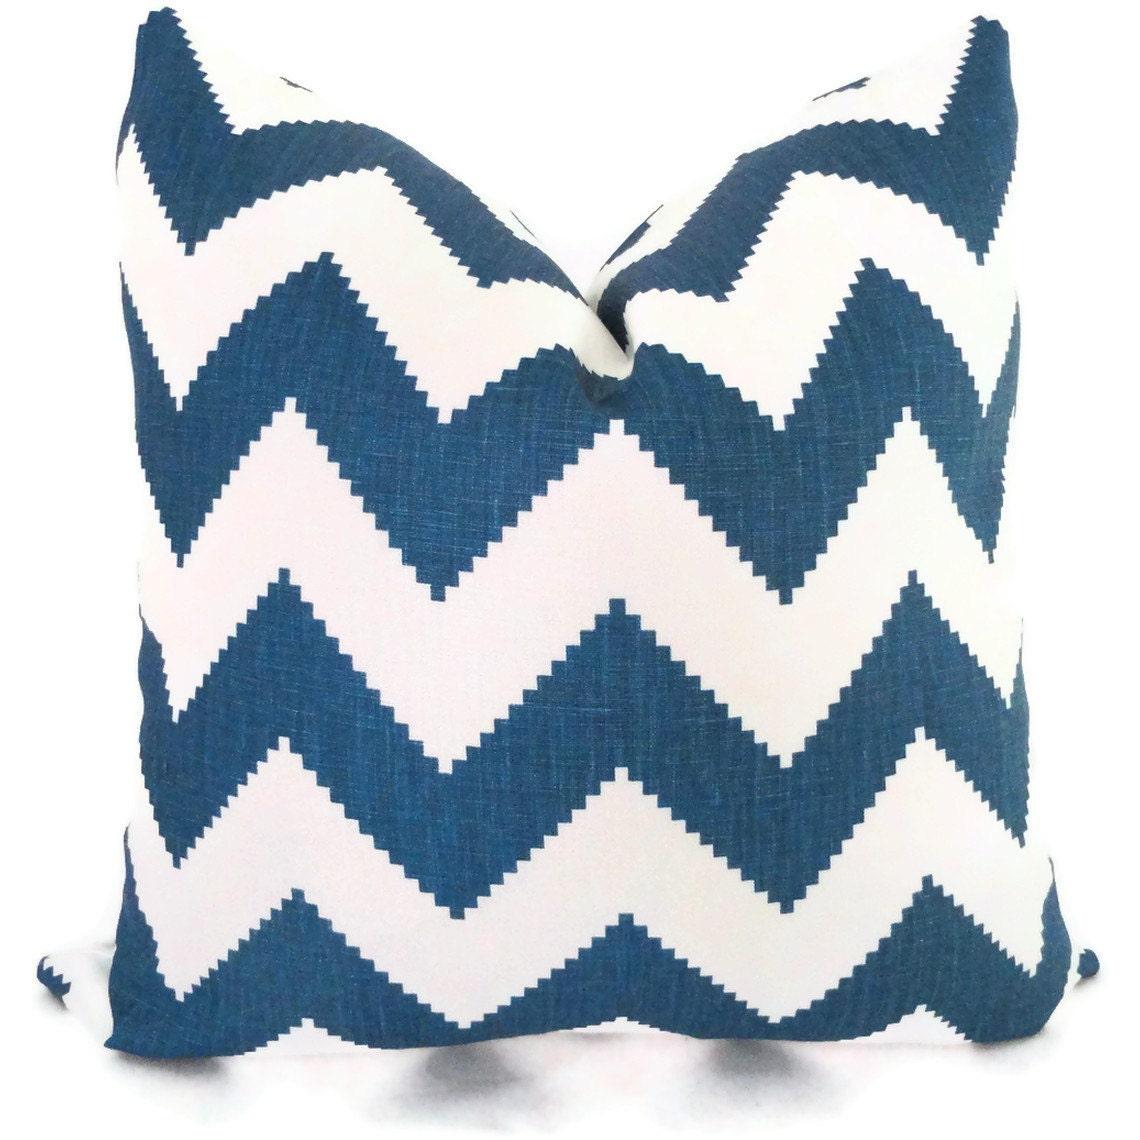 Marine Blue Throw Pillows : Jonathan Adler Marine Blue Chevron Decorative Pillow Cover